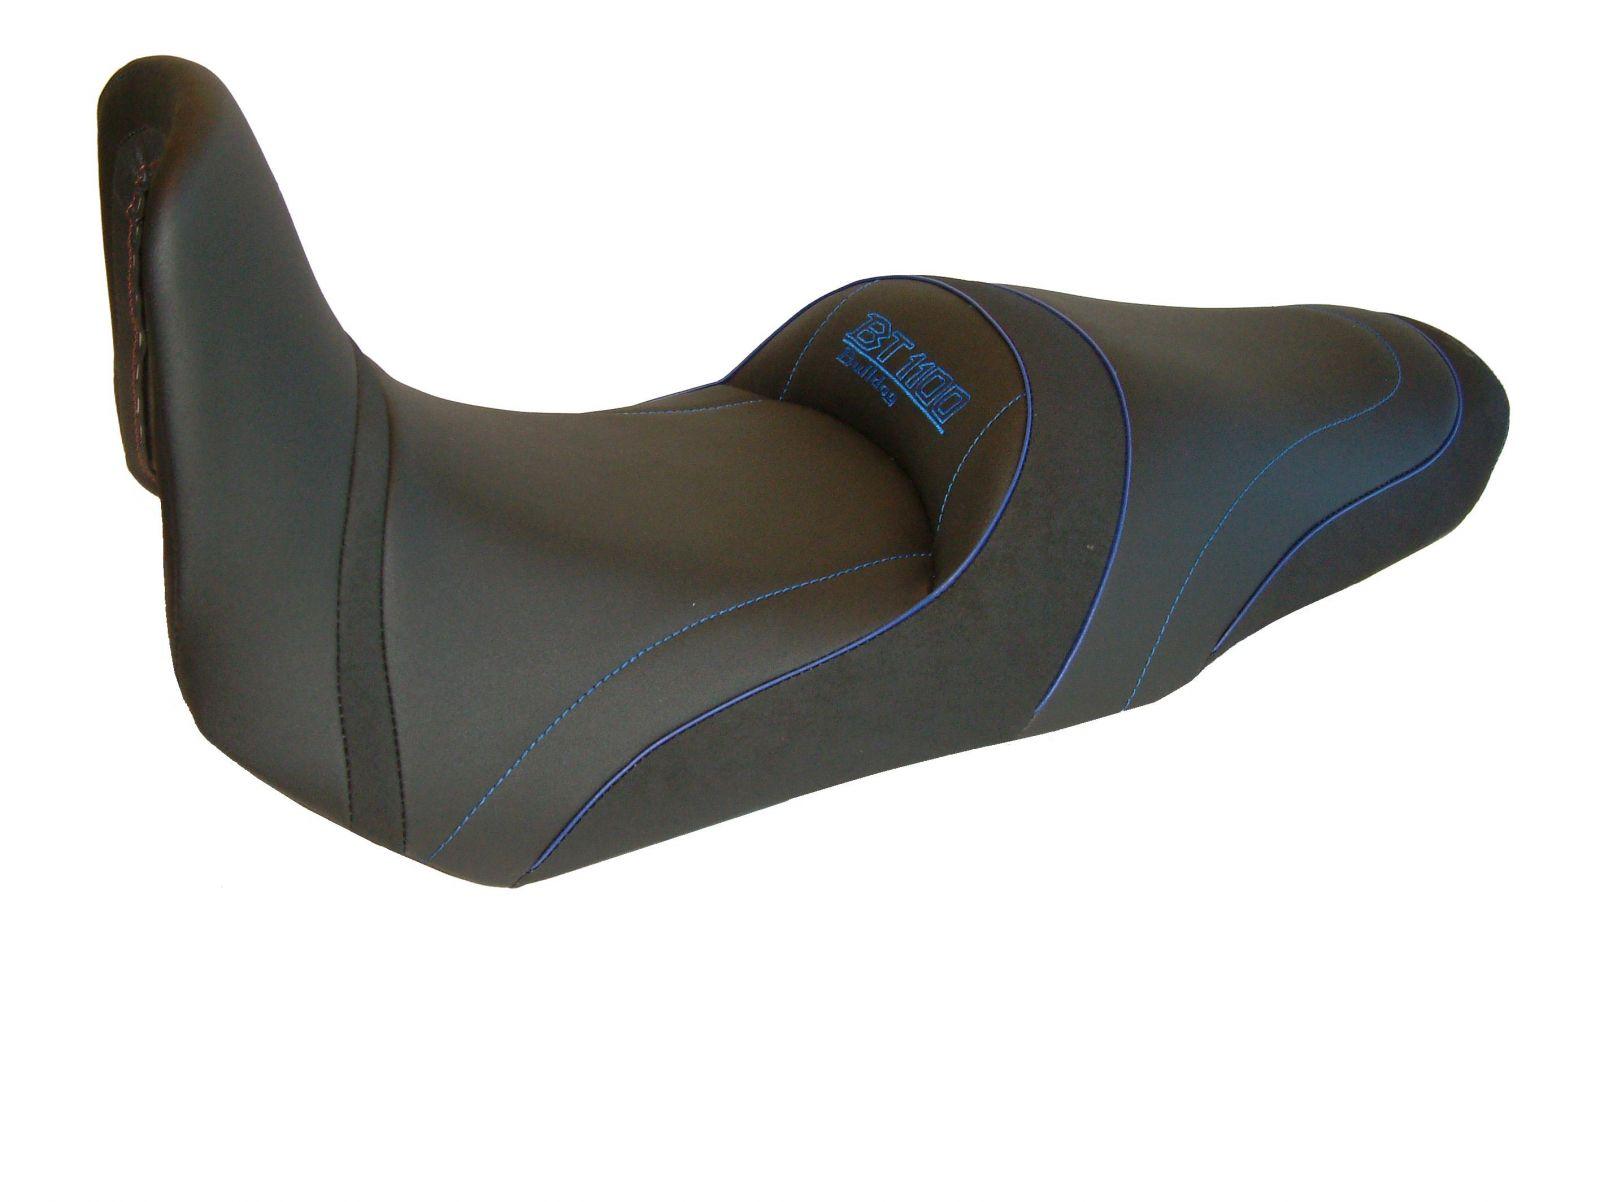 Deluxe seat SGC1417 - YAMAHA BULLDOG BT 1100 [2001-2006]